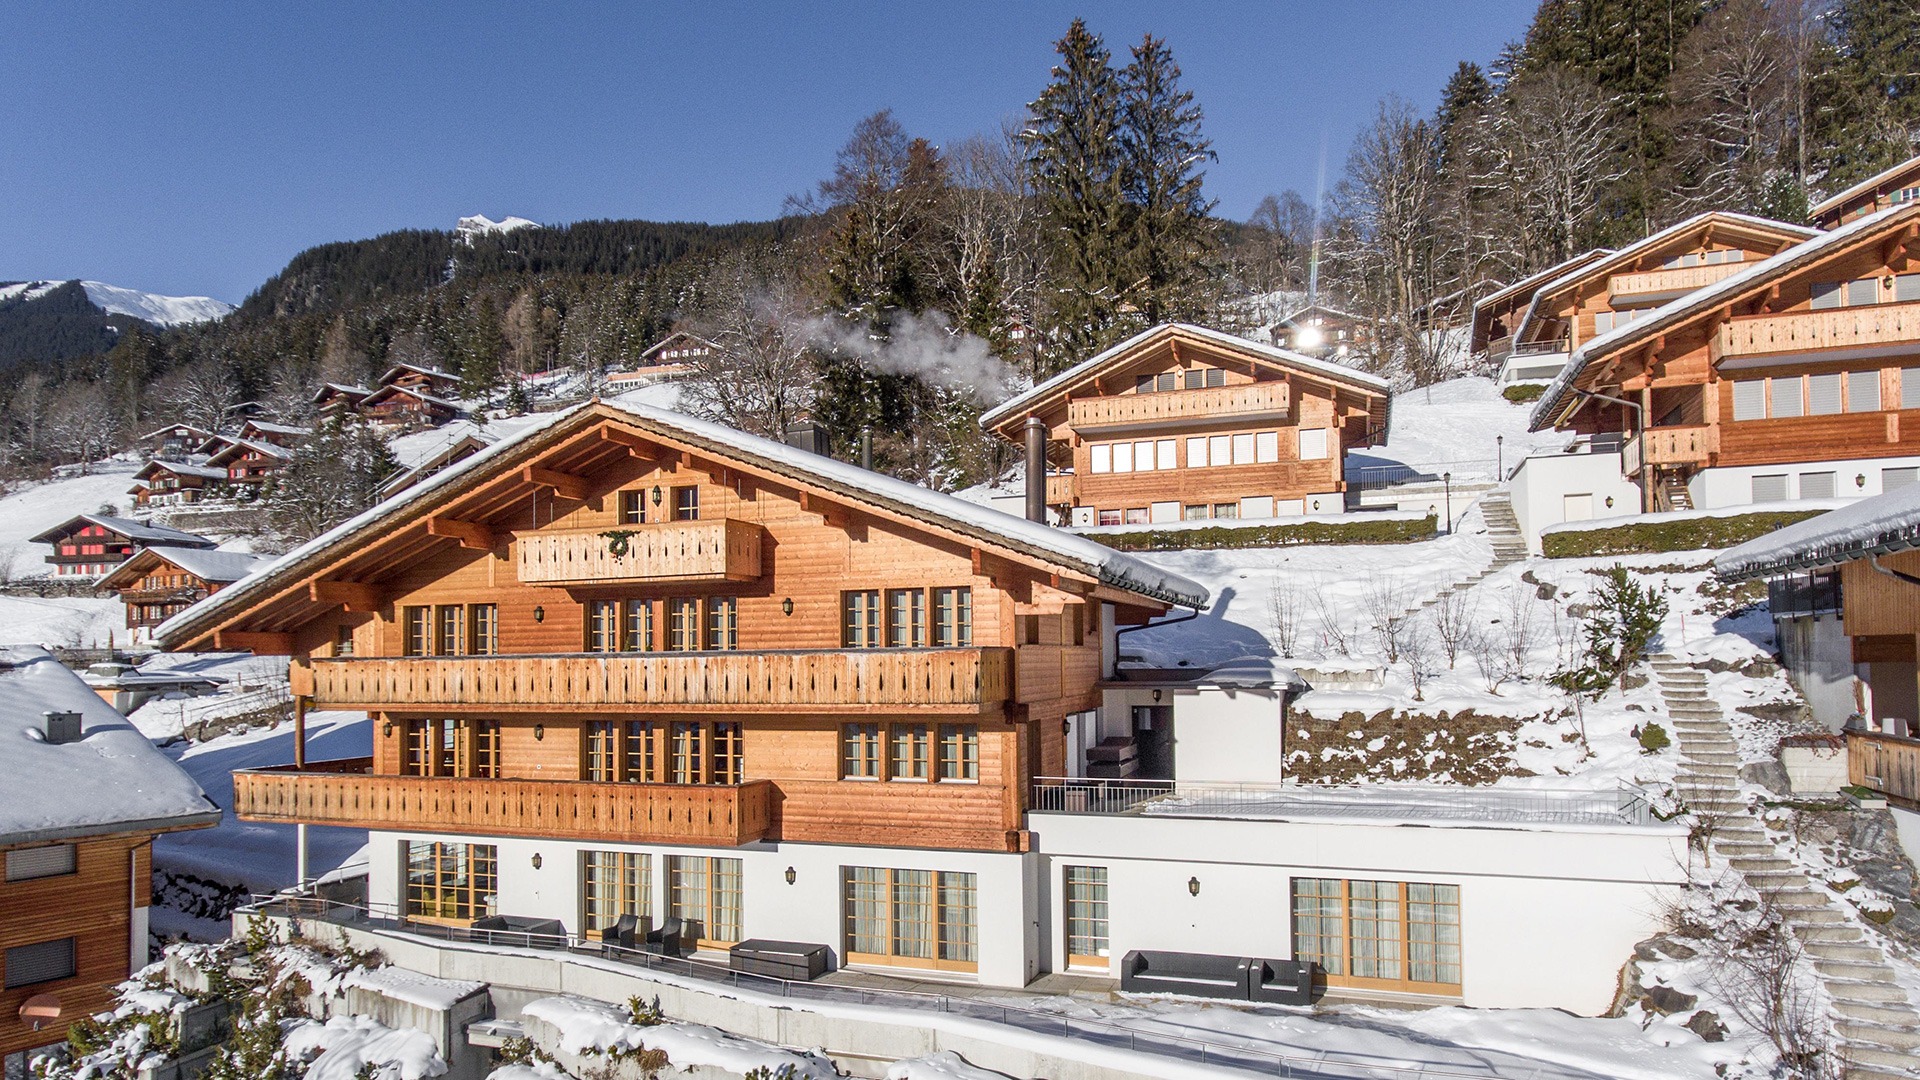 Chalet Rotstöcki Chalet, Switzerland